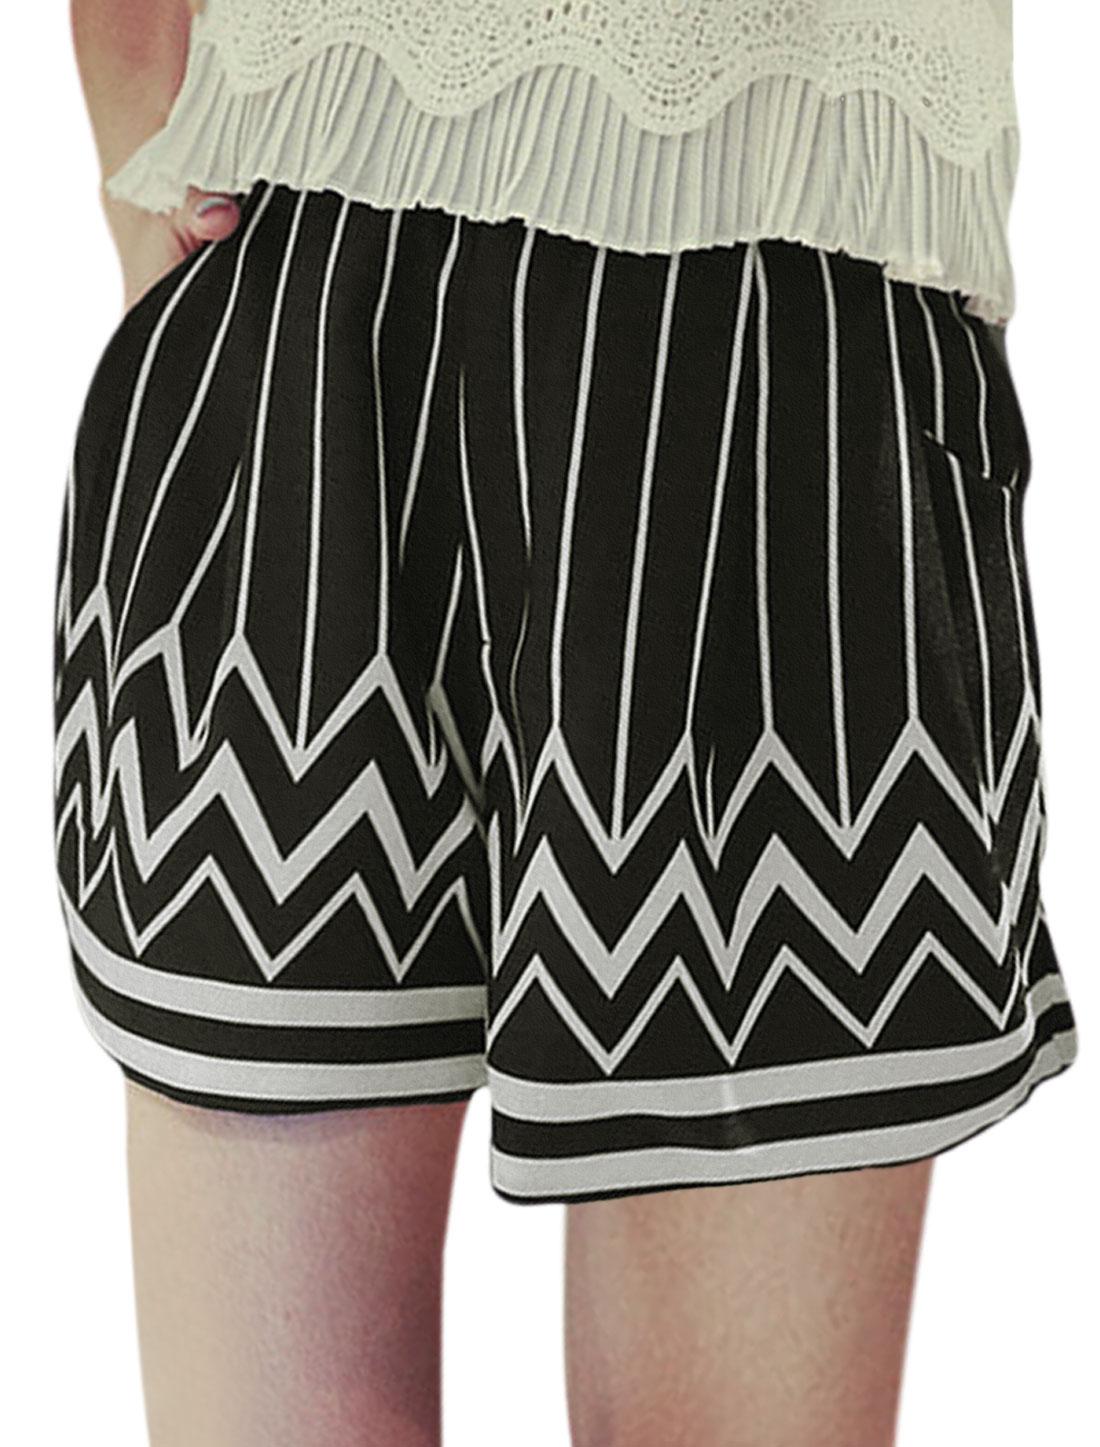 Ladies Elastic Waist Zigzag Print Front Pockets Short Shorts Black XS